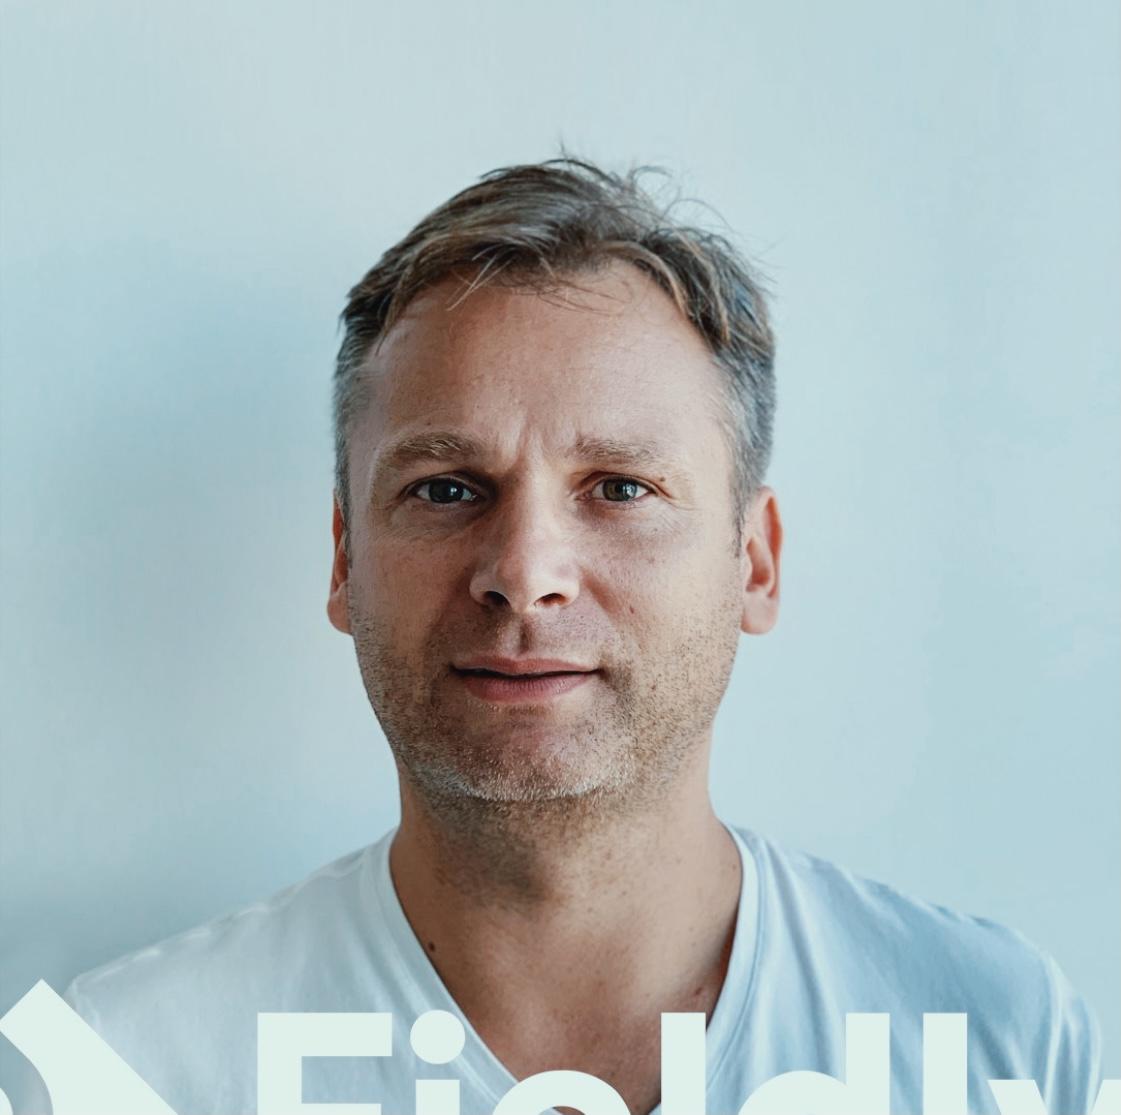 Meet Andrzej Zawadzki - the construction industry expert at Fieldly!